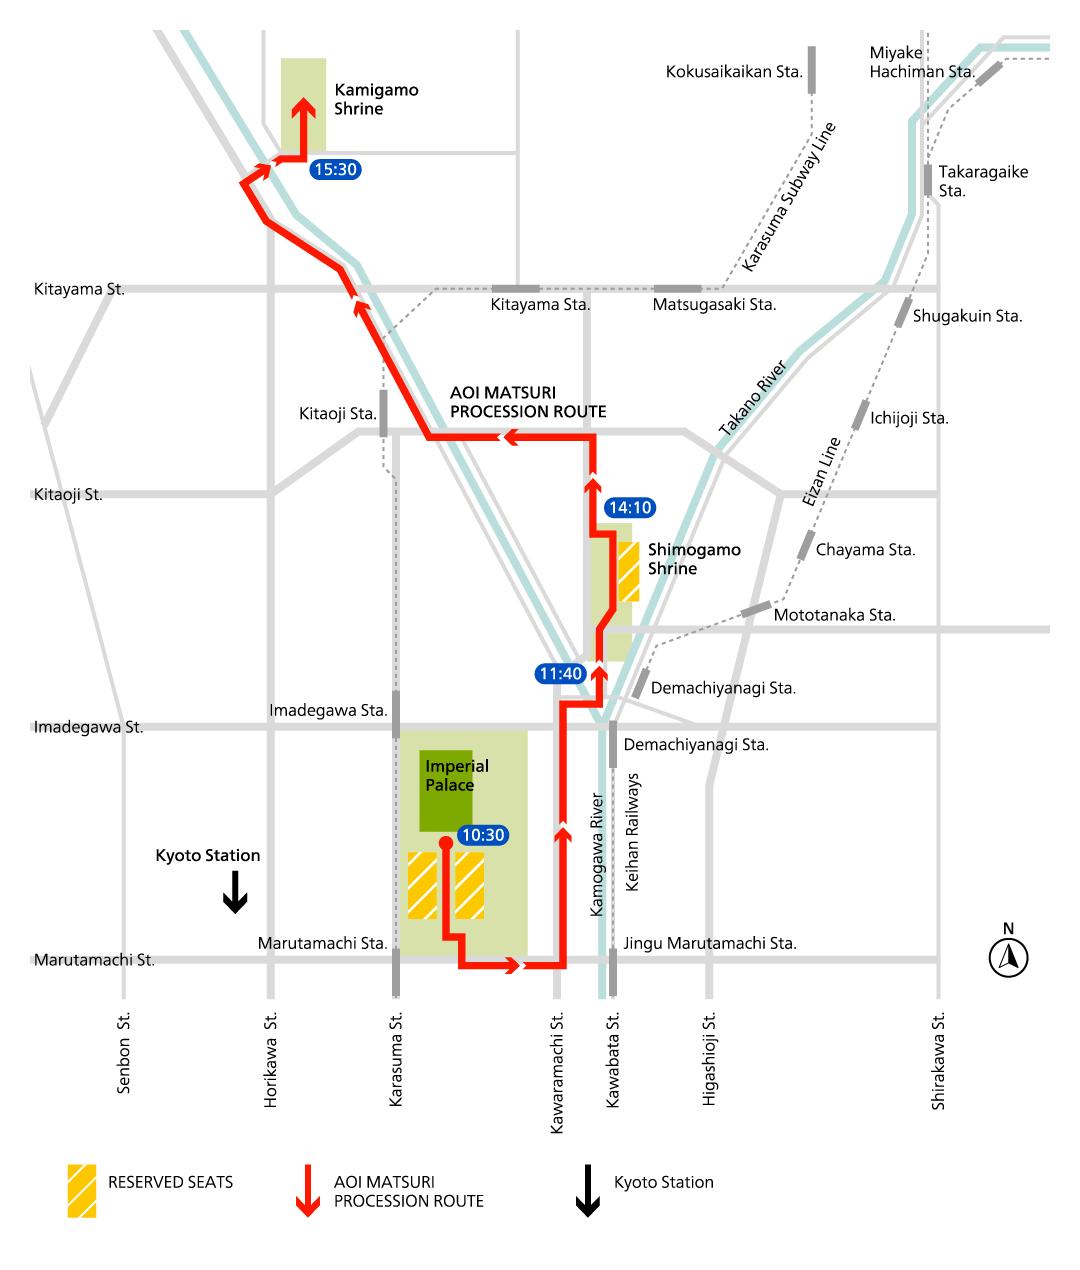 aoi matsuri route map